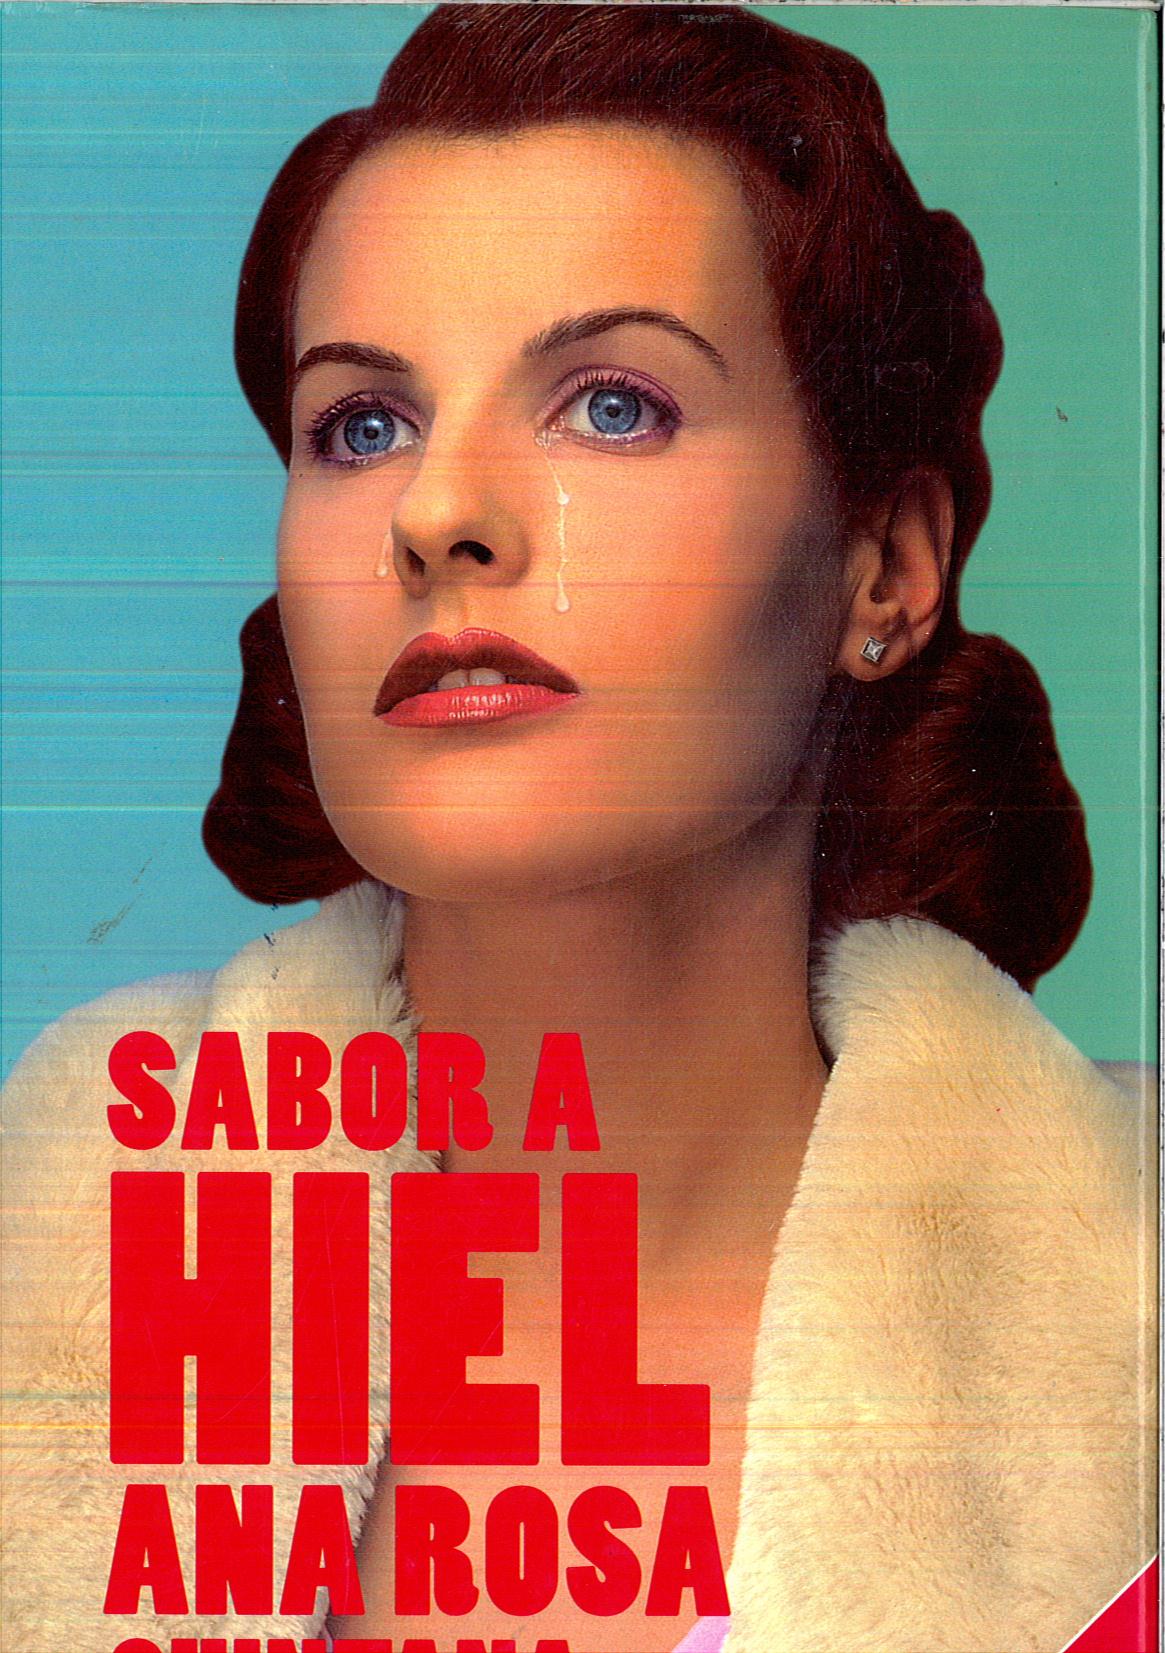 Sabor a hiel de quintana ana rosa uniliber - Libreria hispanoamericana barcelona ...